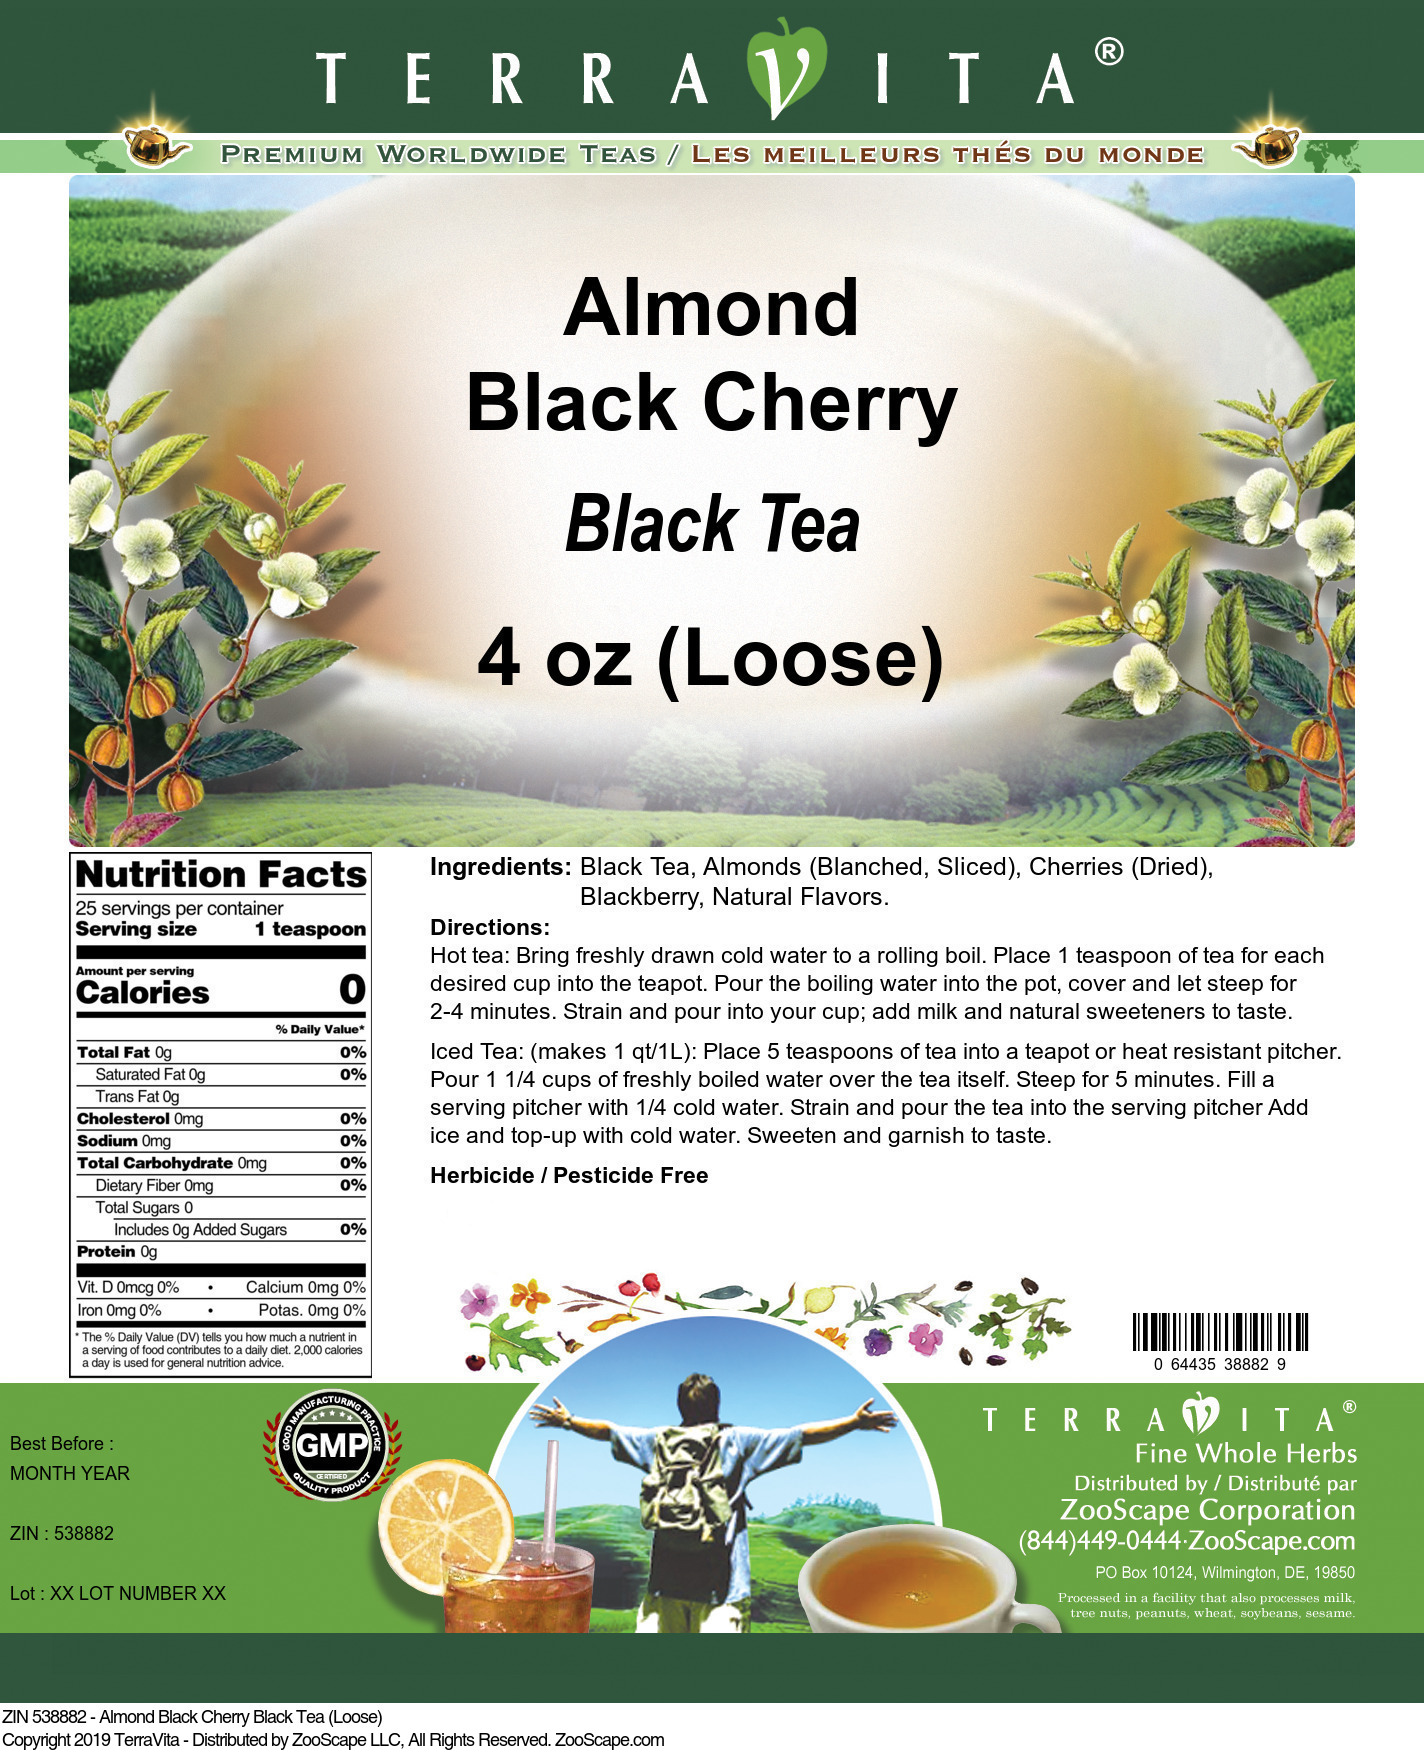 Almond Black Cherry Black Tea (Loose)